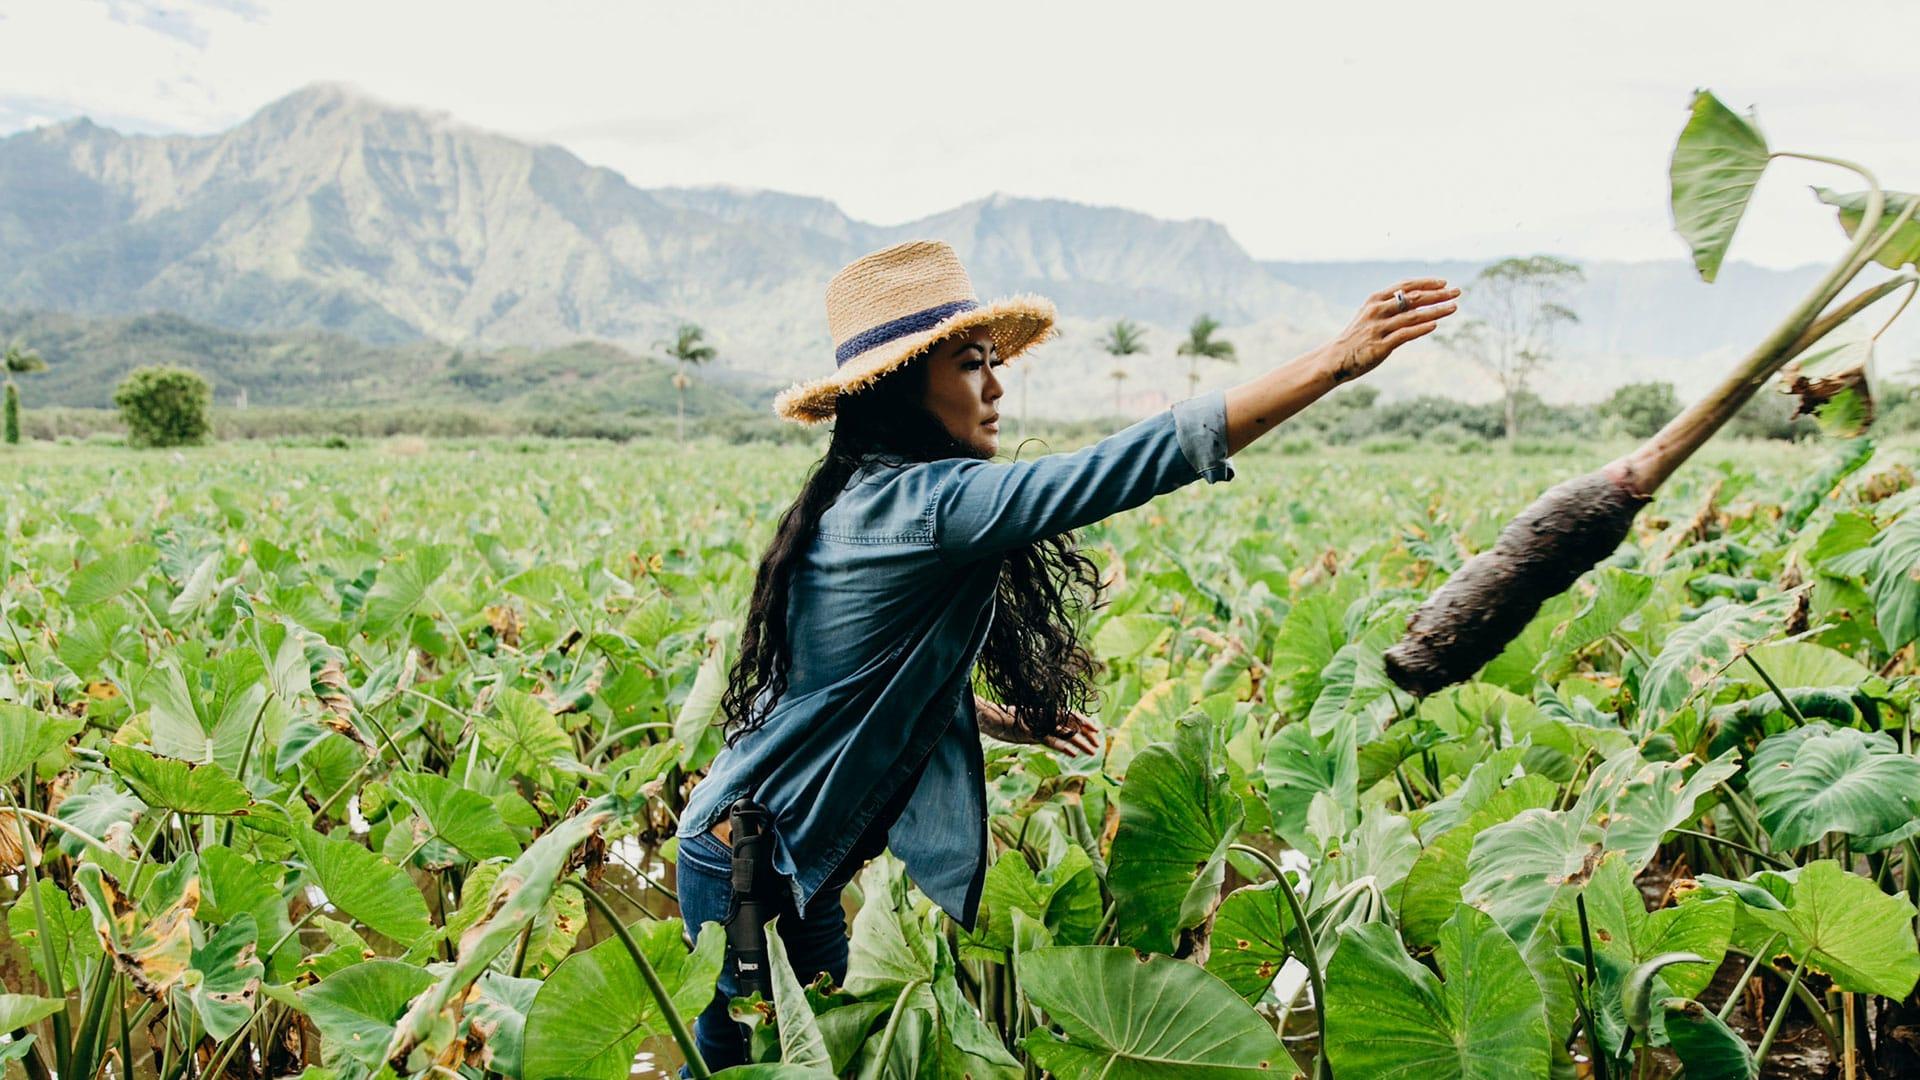 Seeds of Perseverance - Lyndsey Haraguchi-Nakayama, Kauai (for mvnp website use only)  Share Seeds of Perseverance - Lyndsey Haraguchi-Nakayama, Kauai